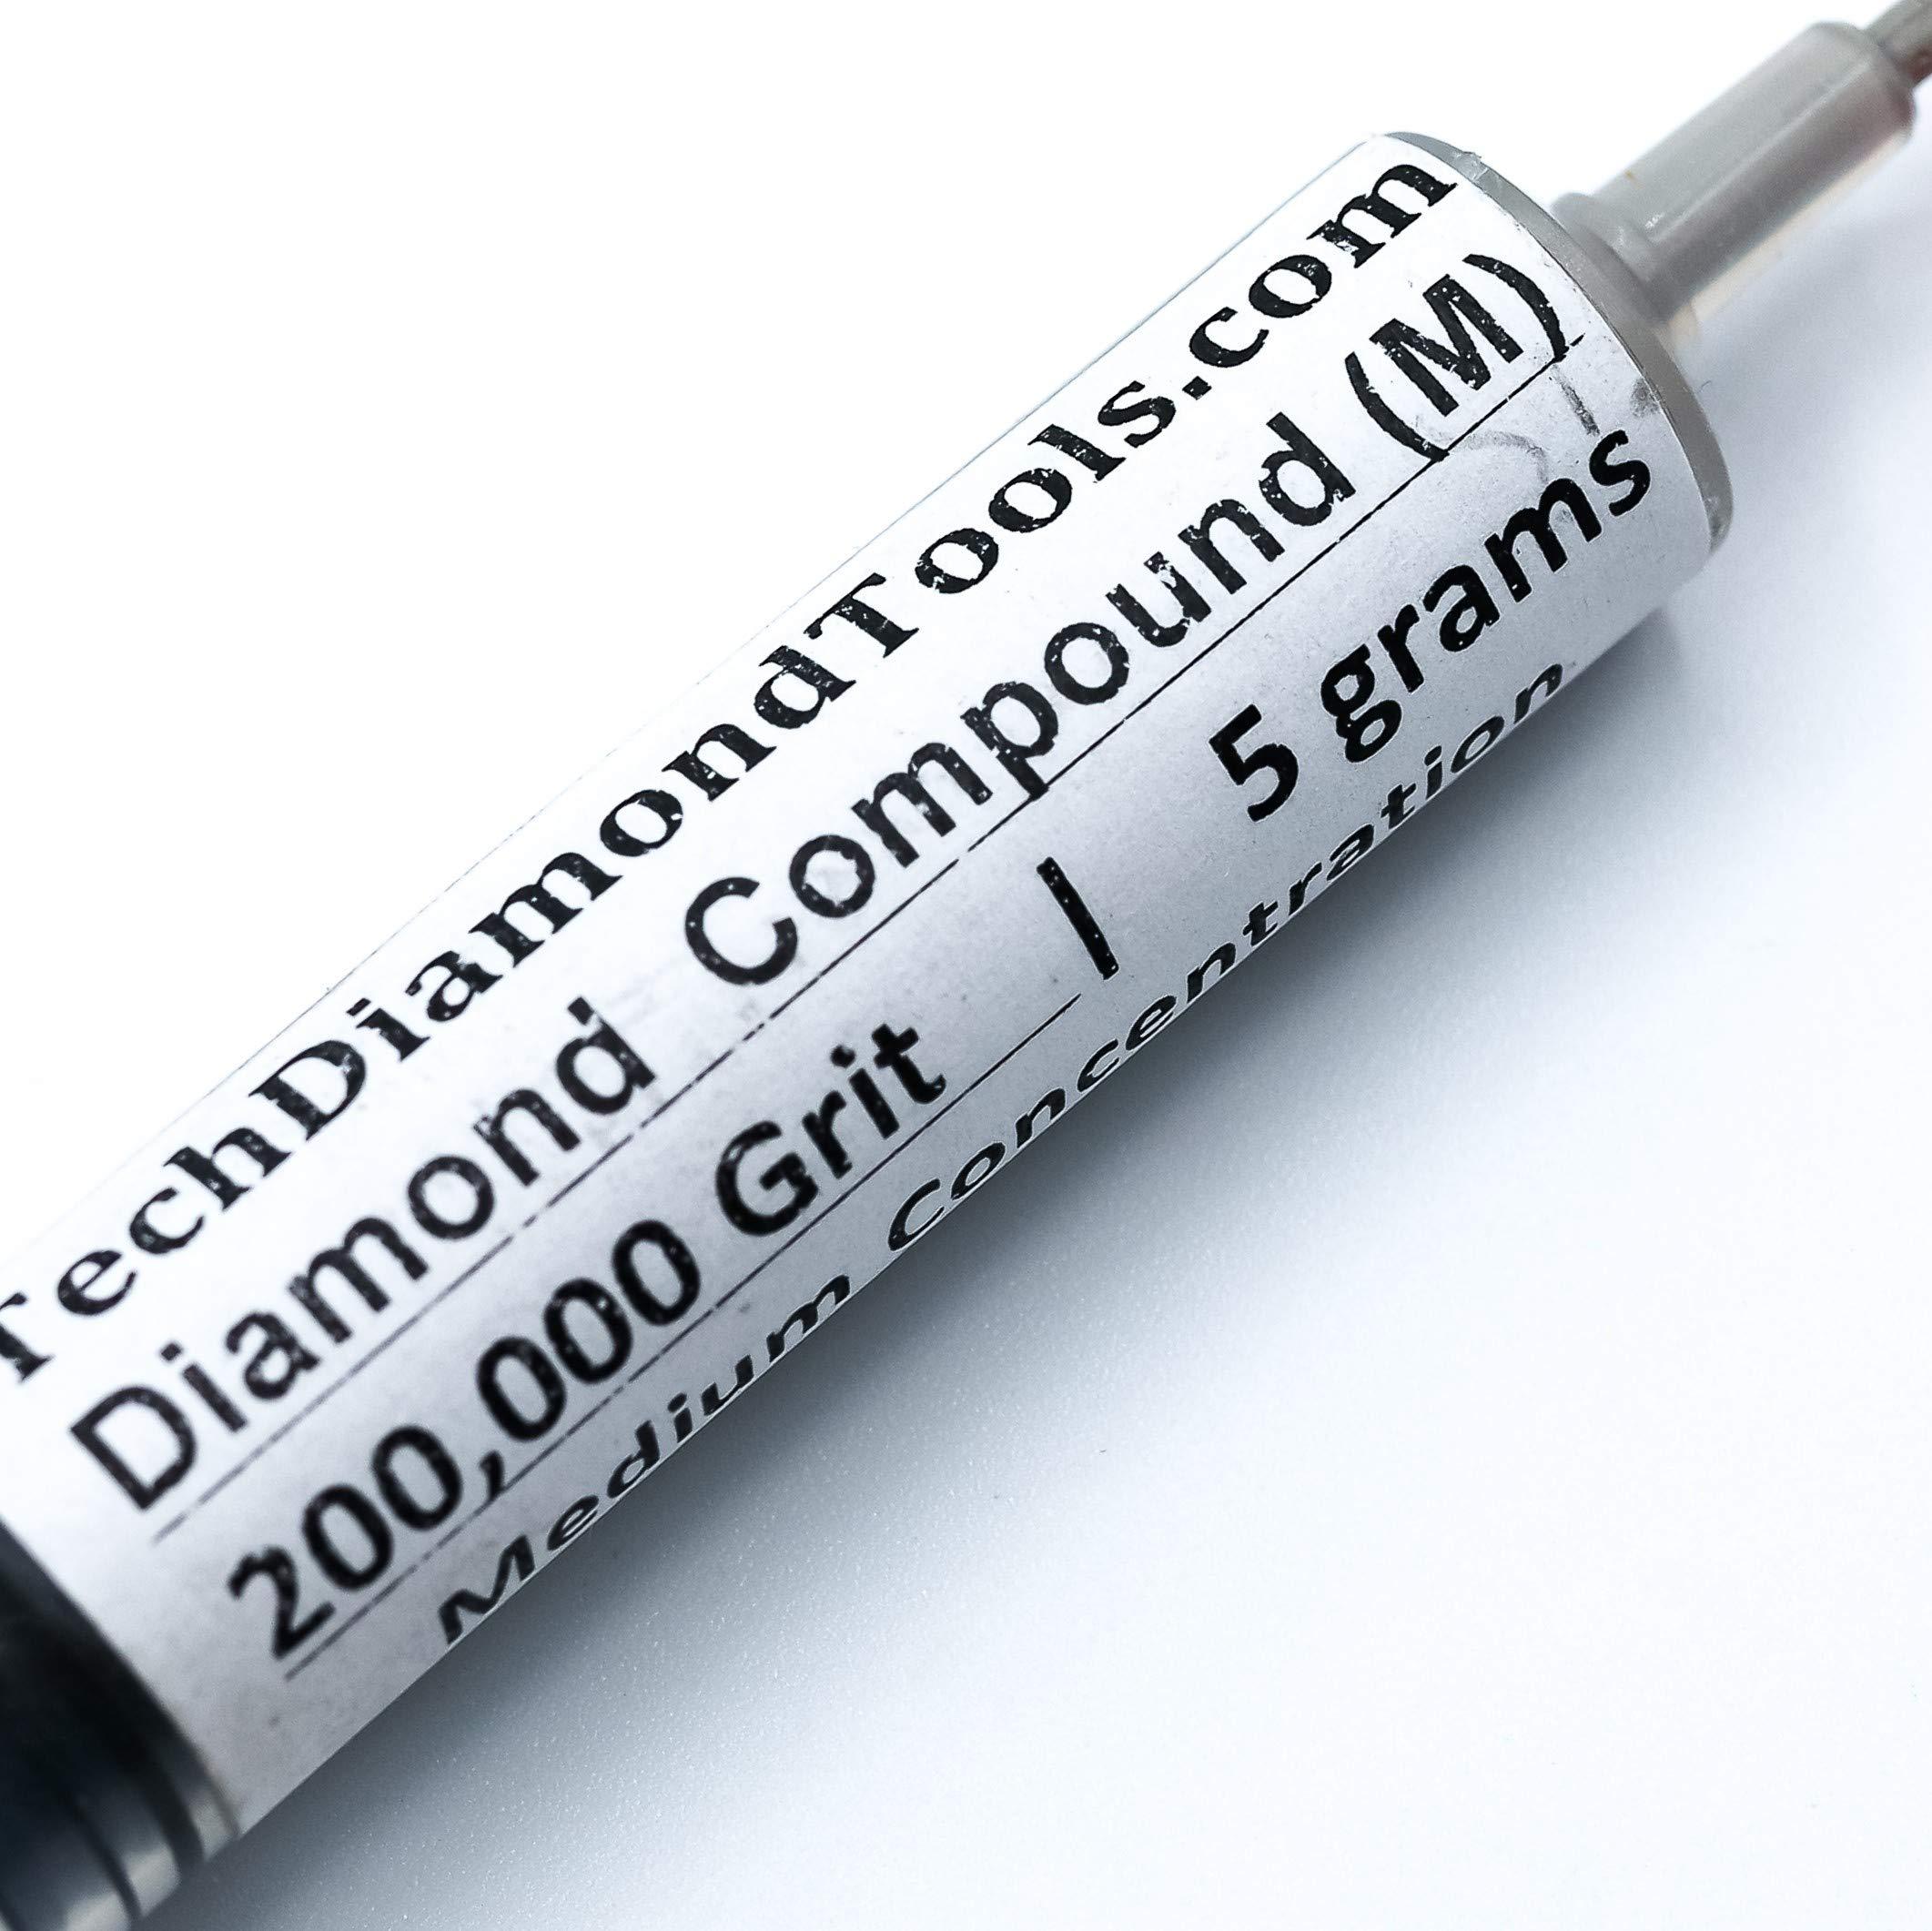 Pasta Pulido c/ Polvo diamante 25% 200000 Grit /0-0.1 Micron